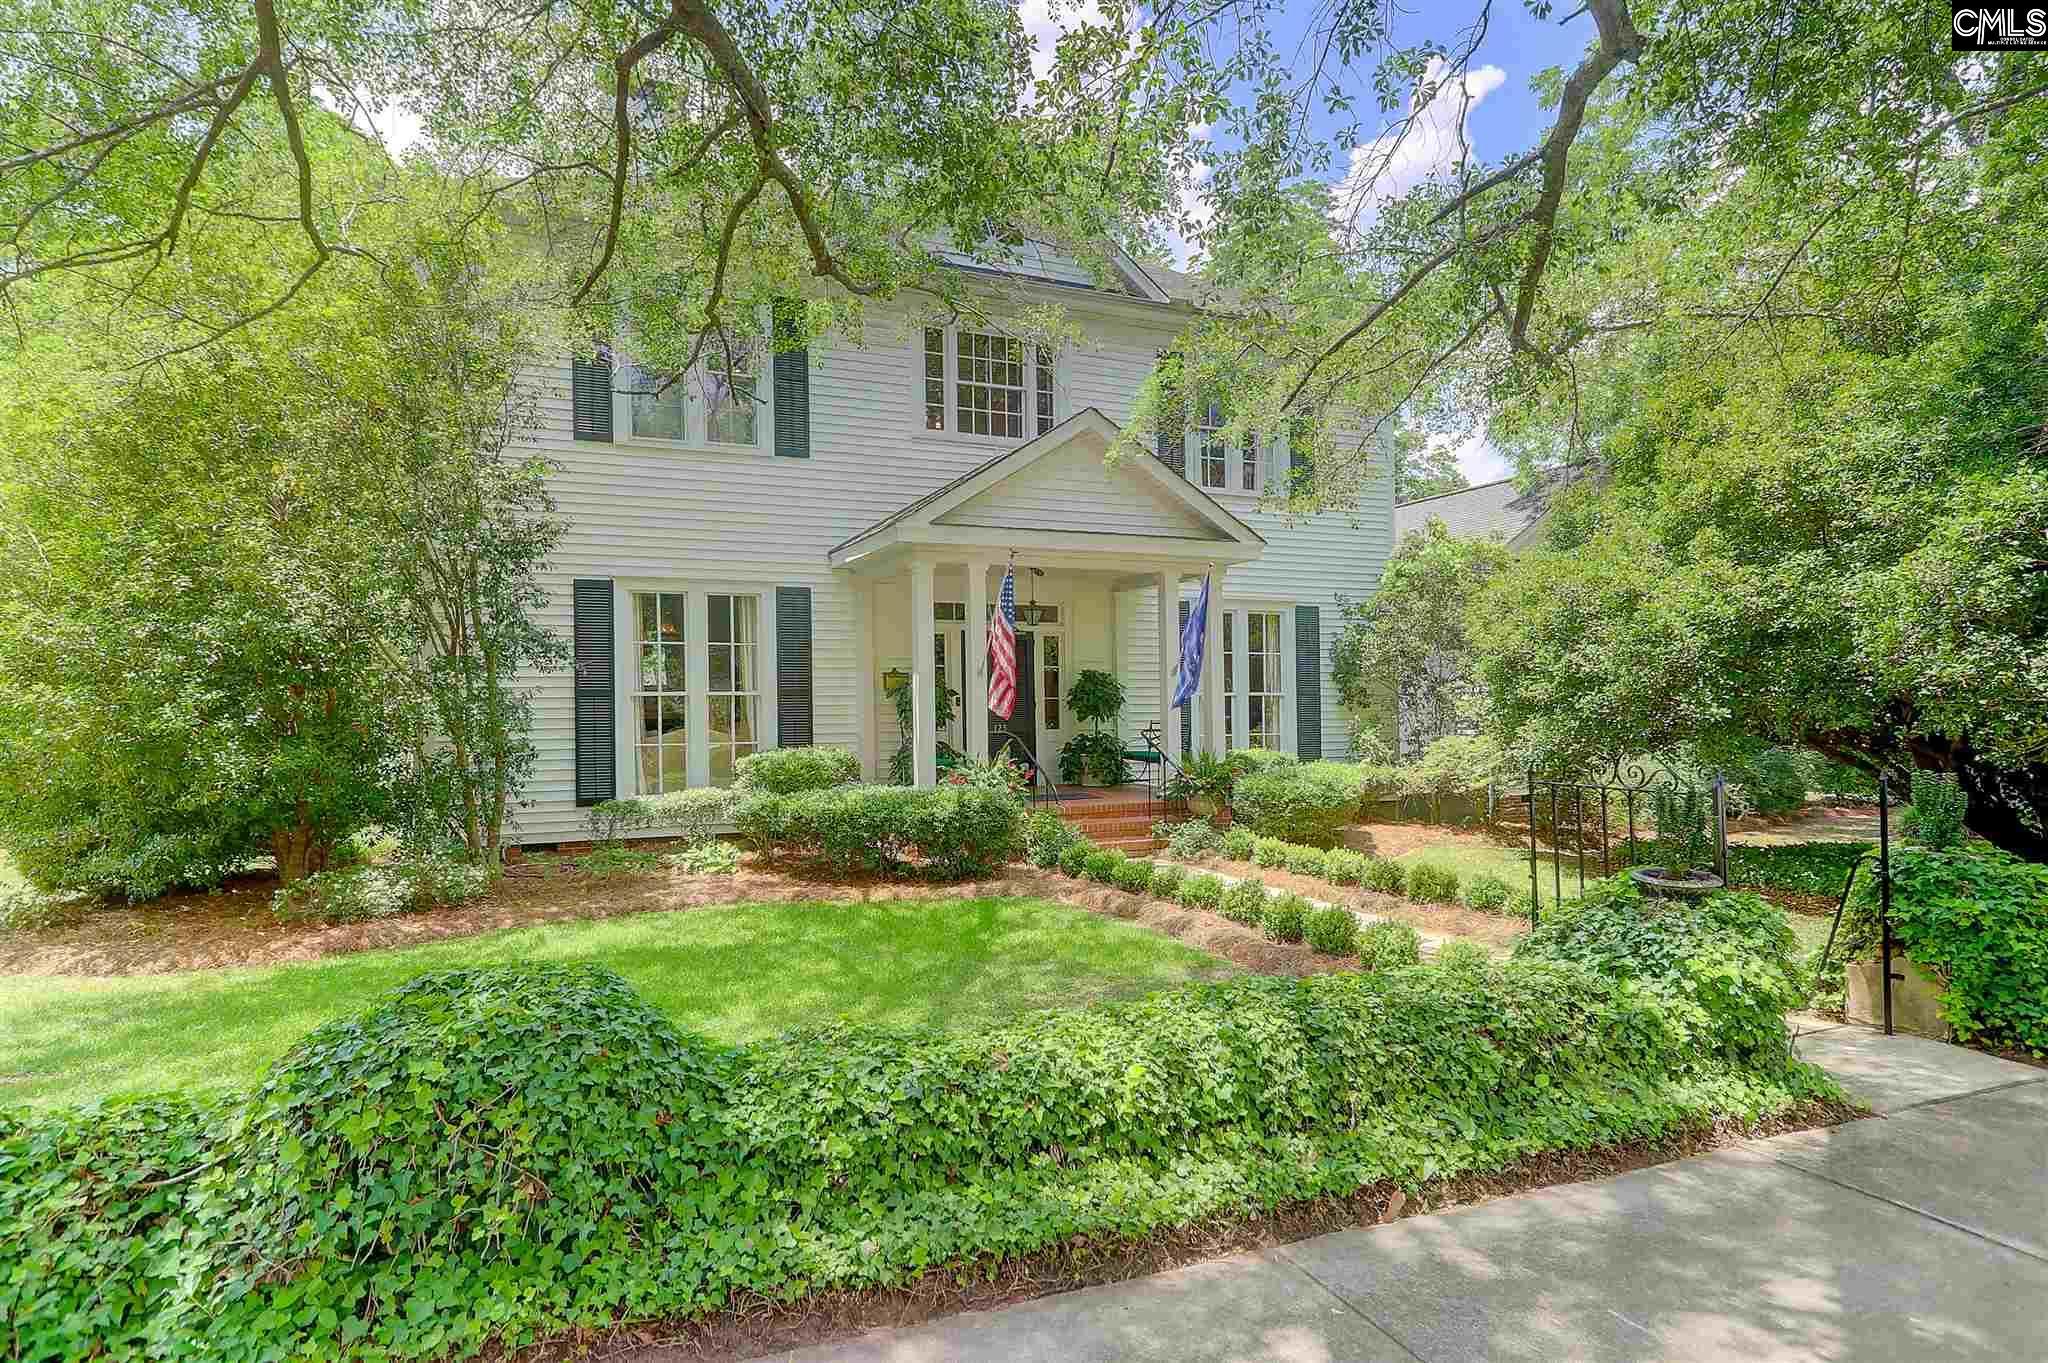 125 S Garden Winnsboro, SC 29180